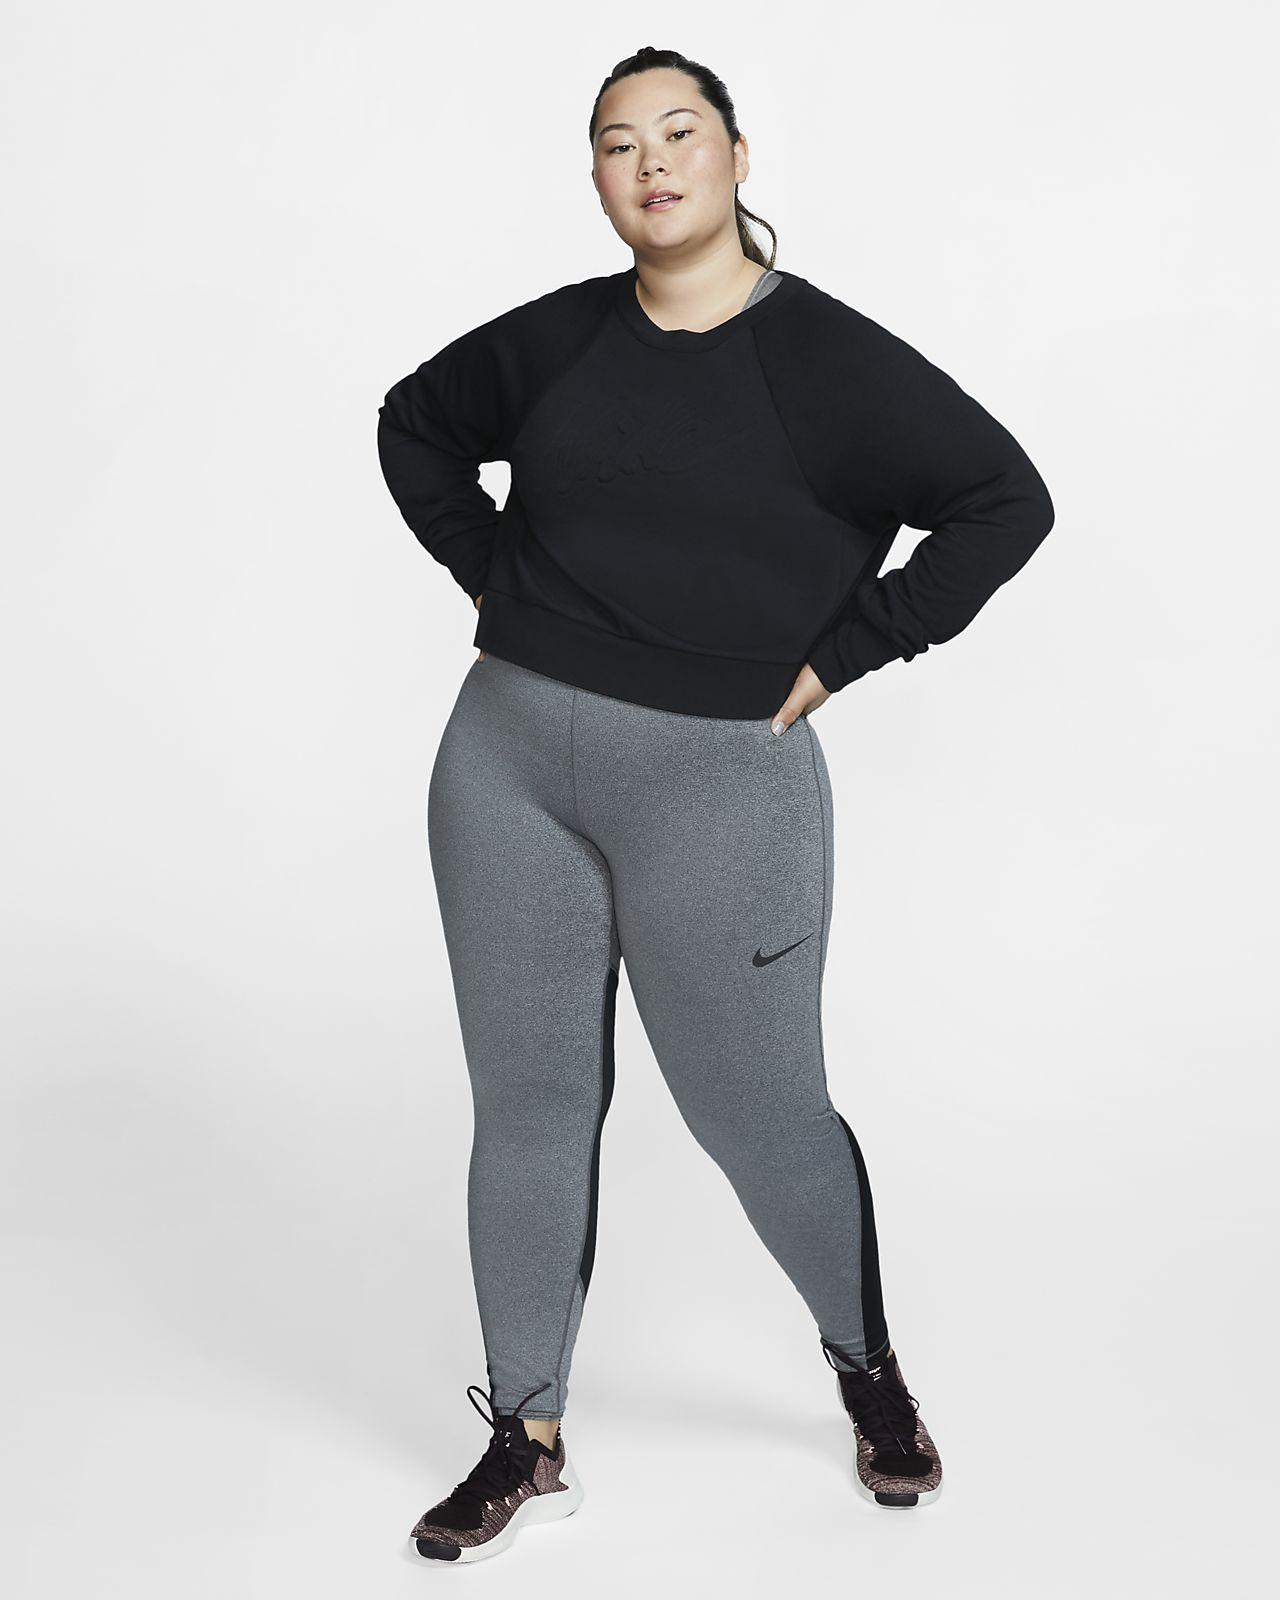 267d46a69309c Nike Dri-FIT Women's Long-Sleeve Training Top (Plus Size). Nike.com CH